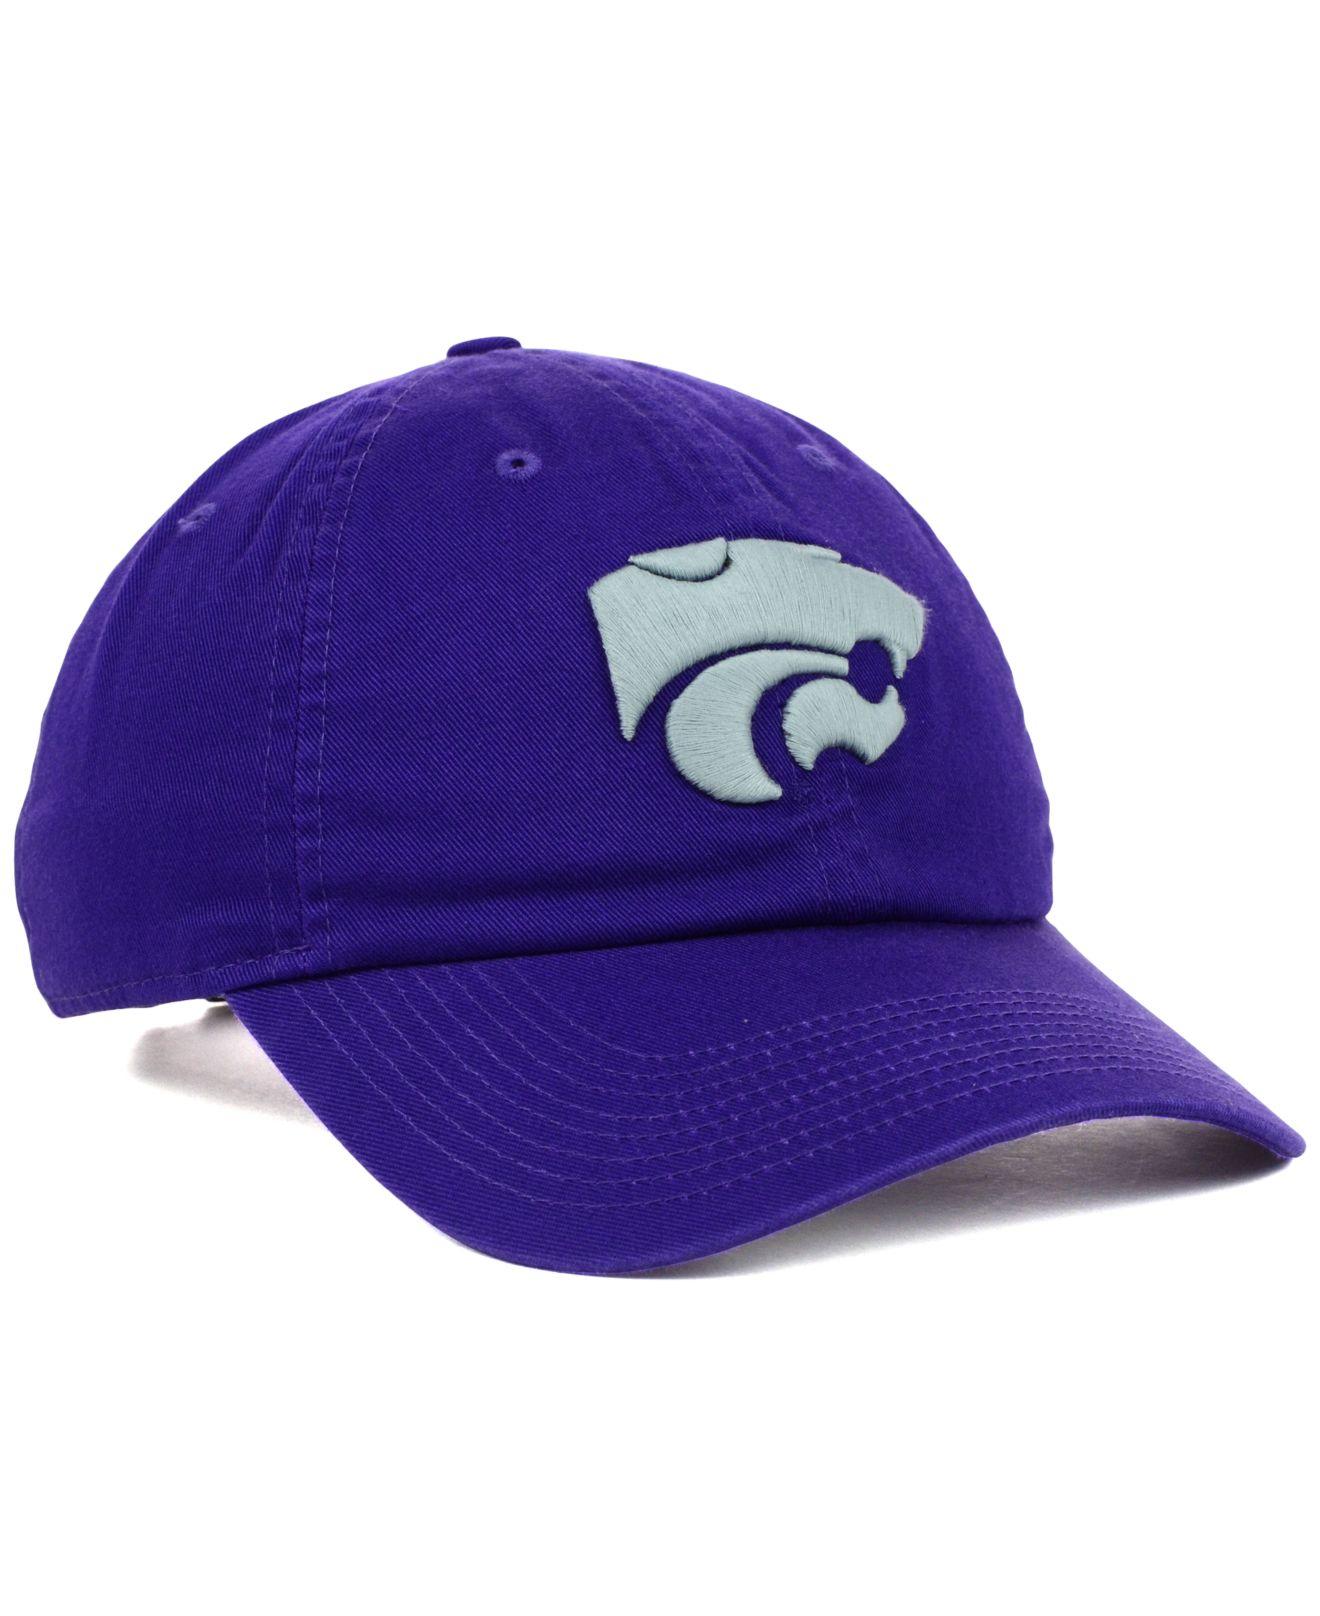 wholesale dealer ced54 b510d Lyst - Nike Kansas State Wildcats Ncaa Dri-fit Swooshflex Cap in ...